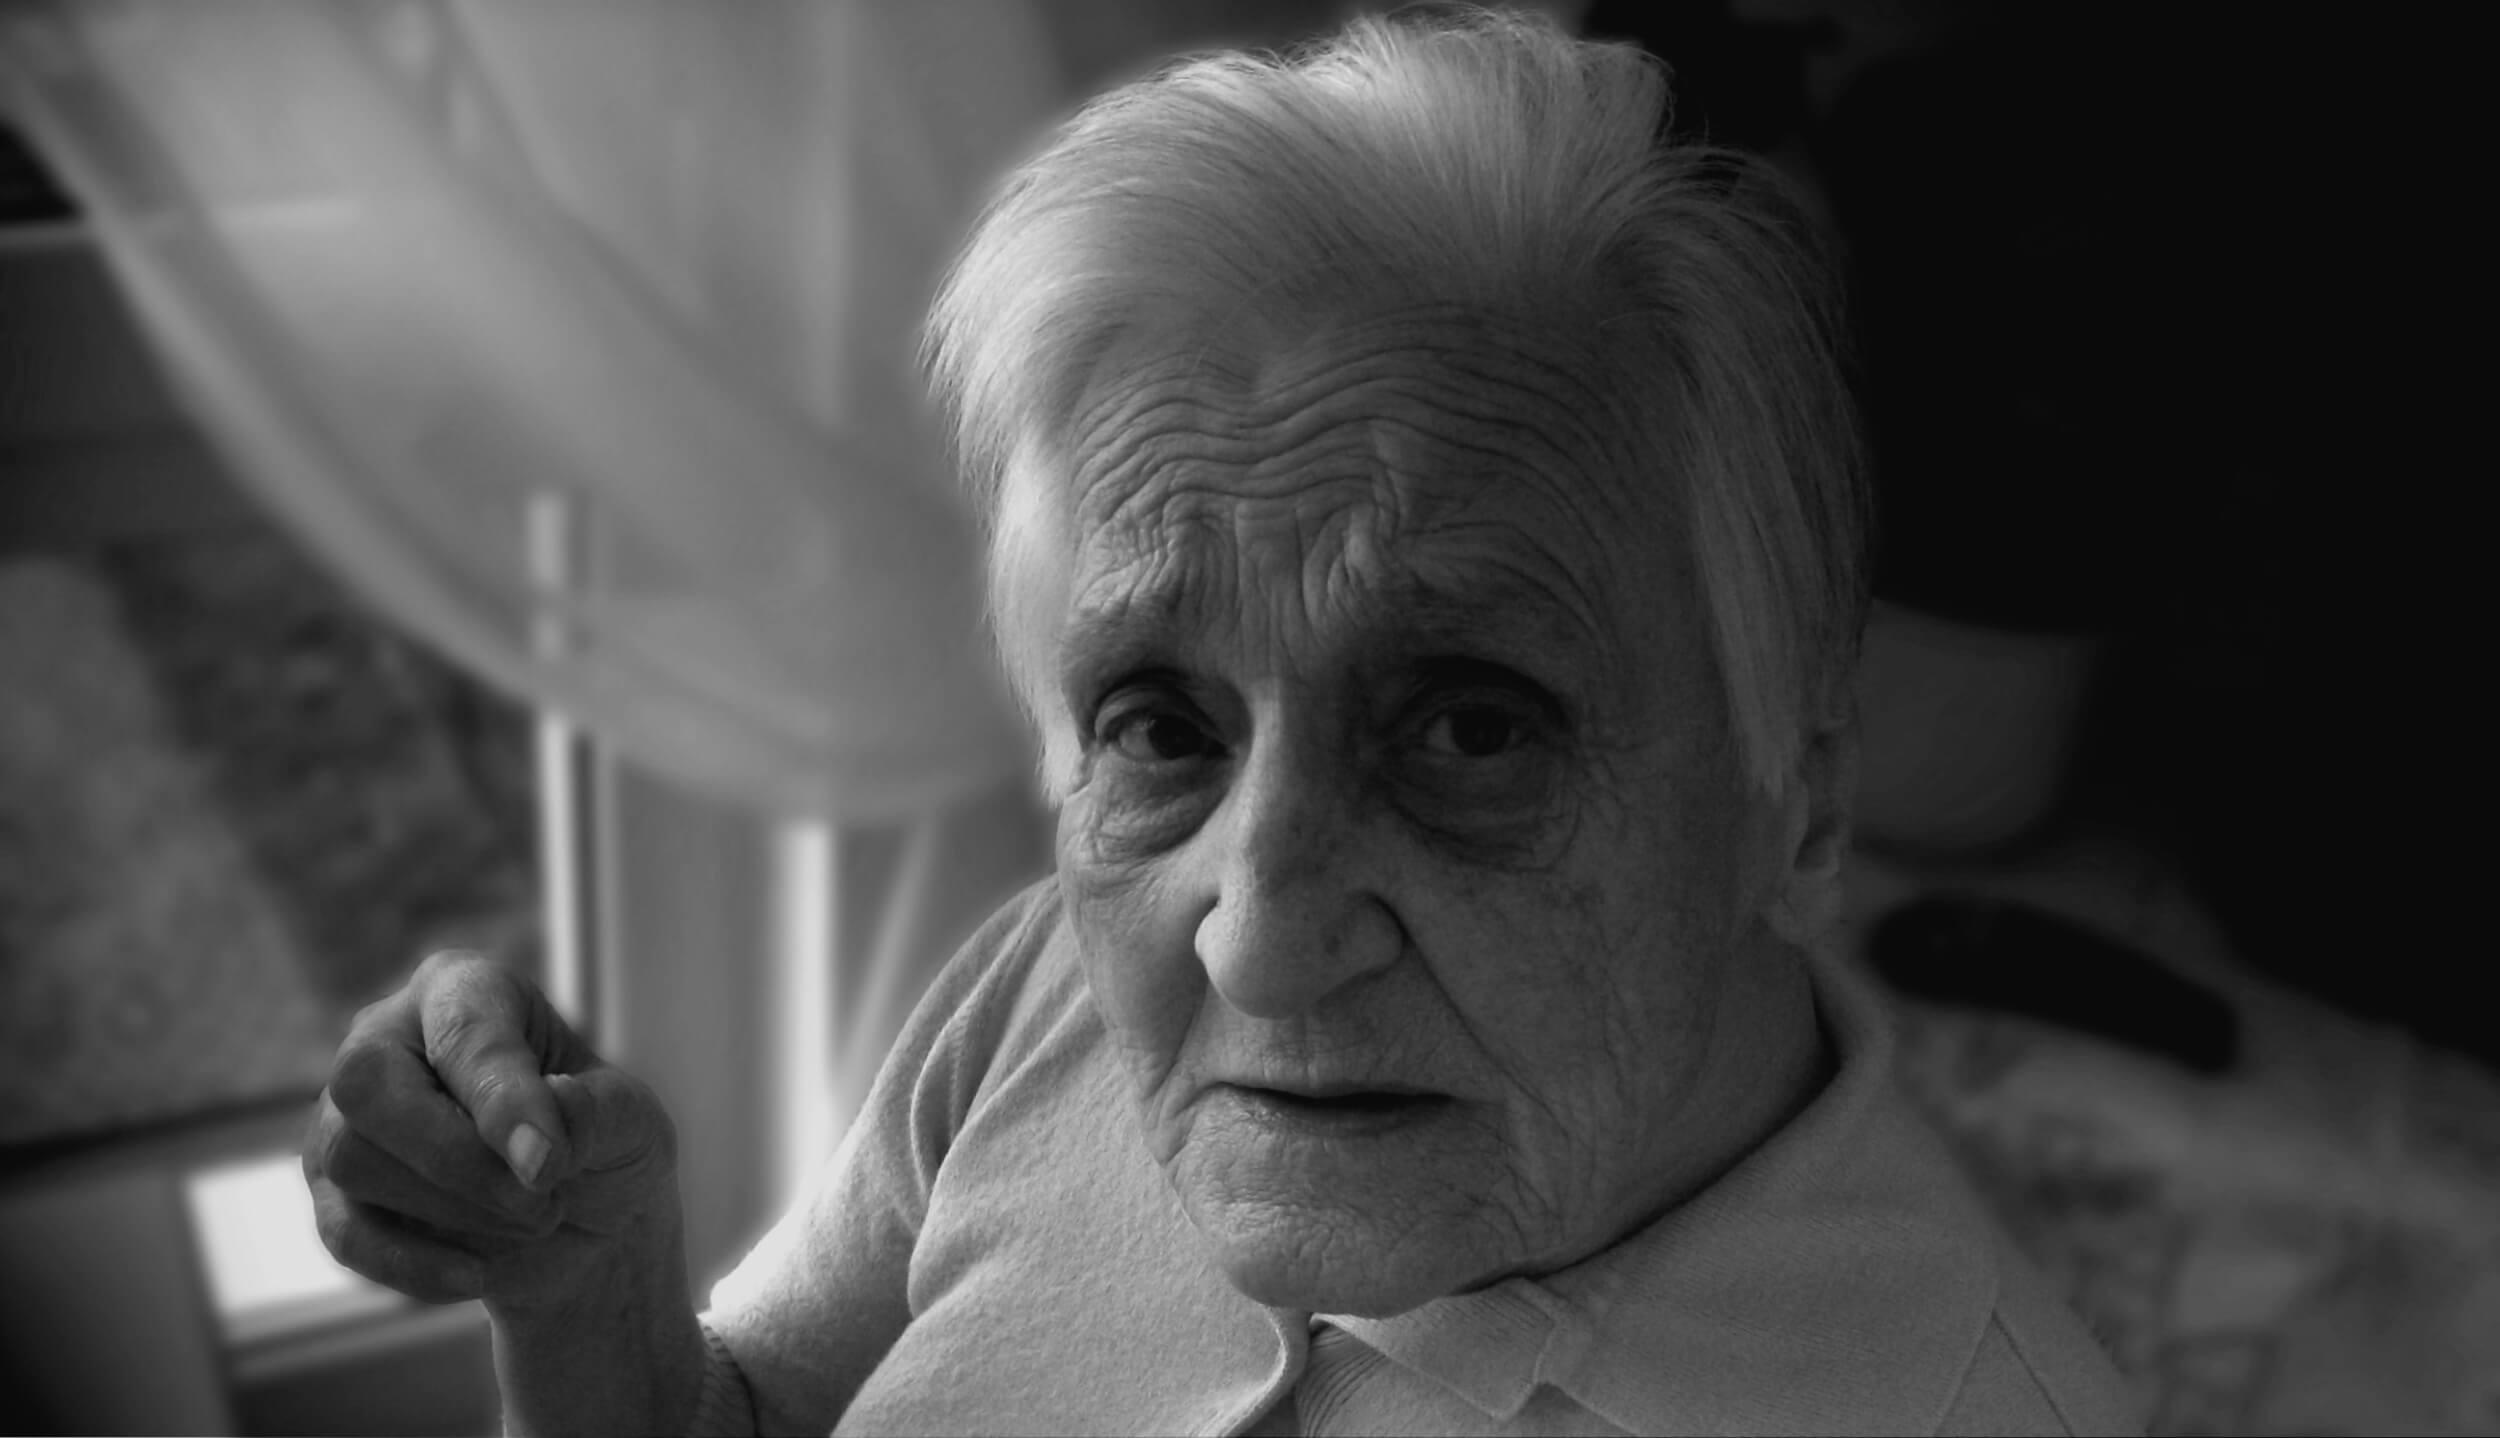 Seniorin mit Demenz (c) Gerd Altmann / pixabay.de